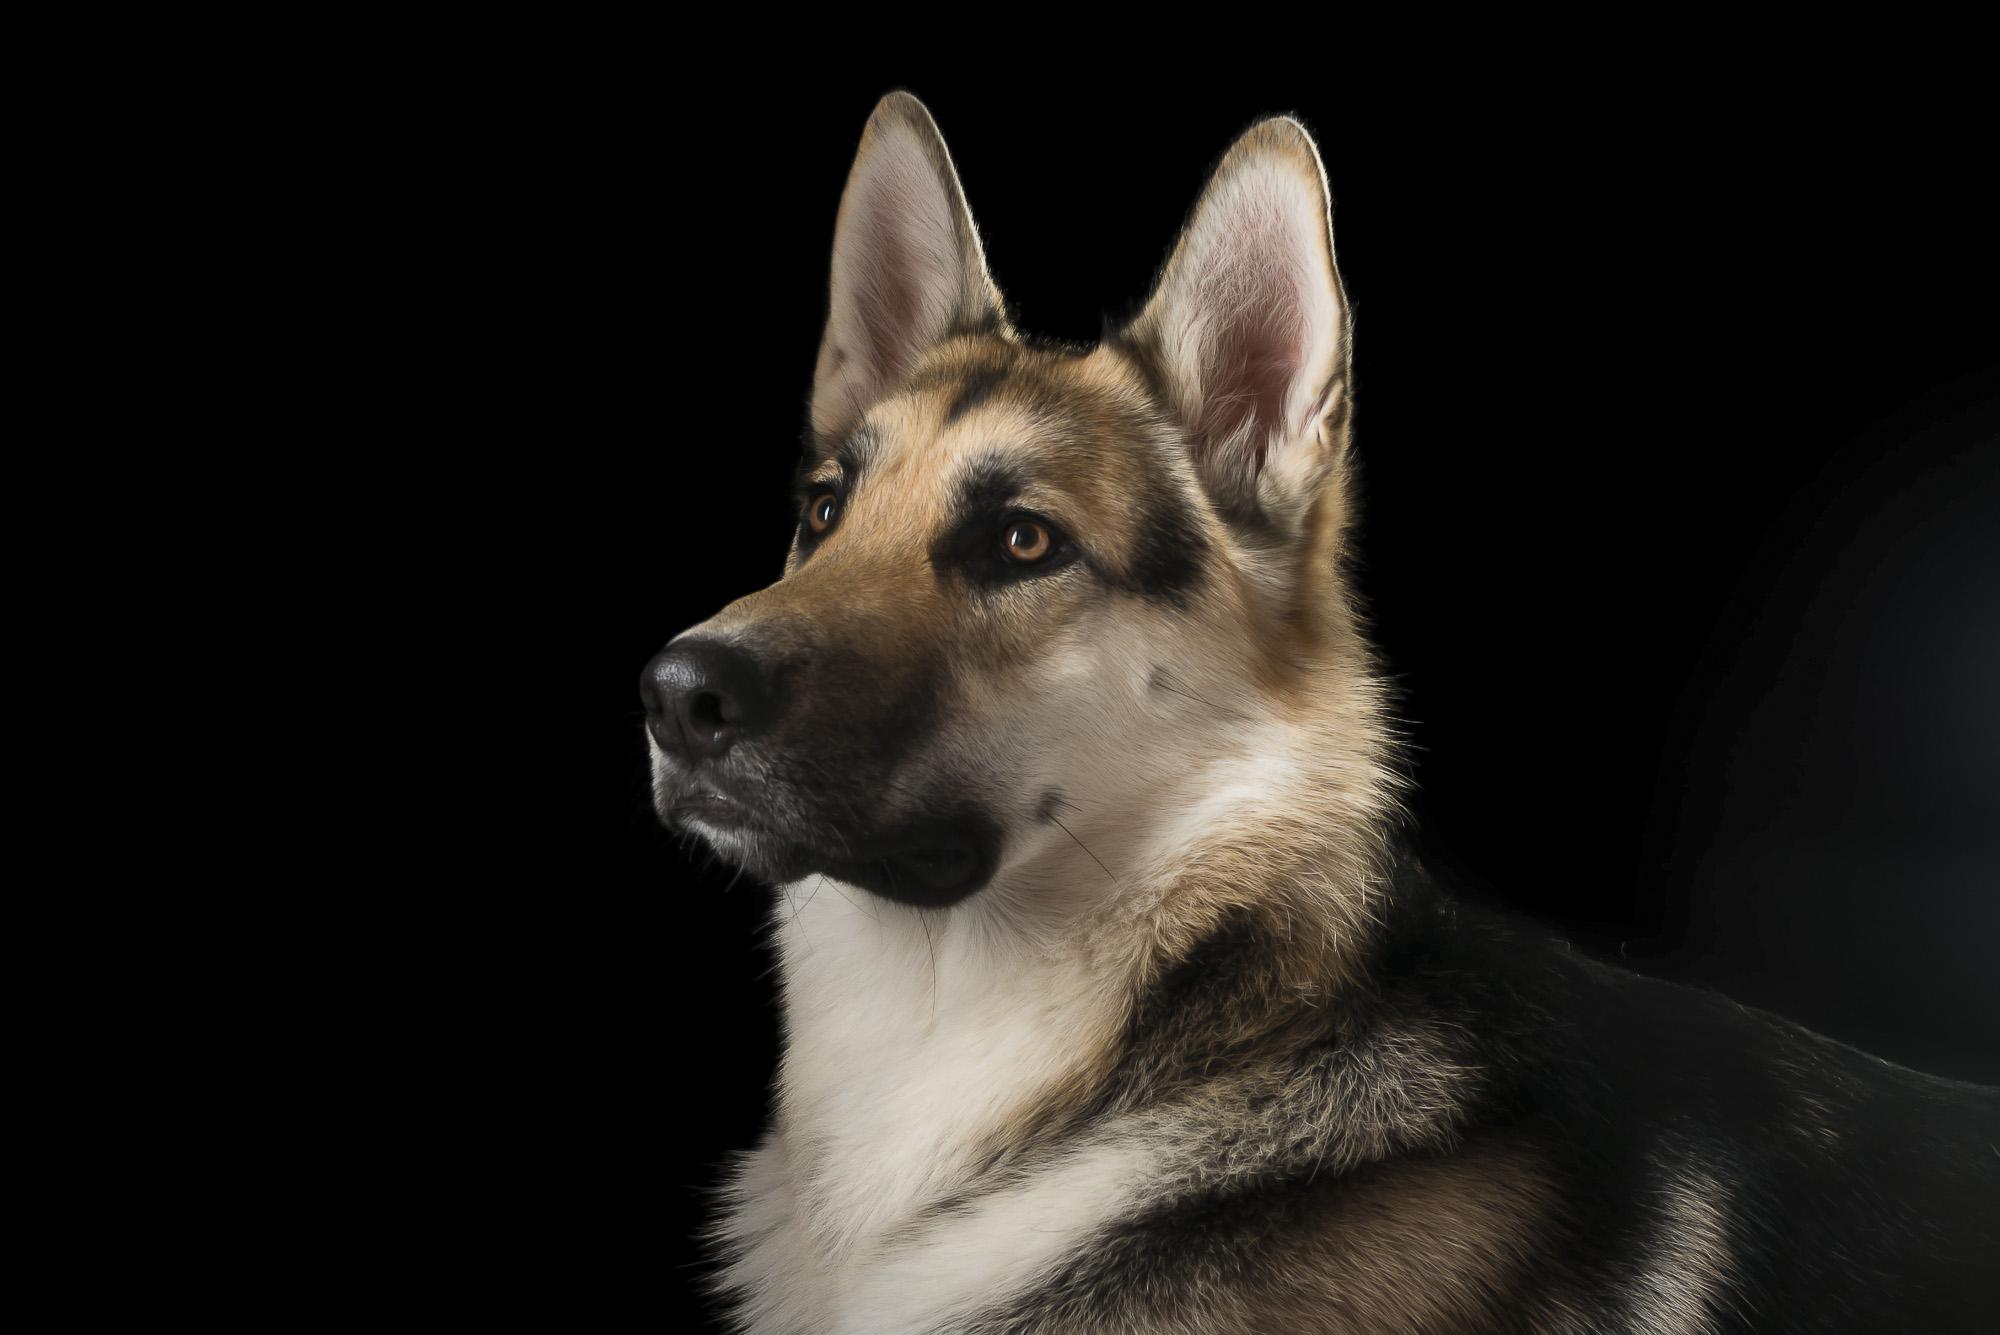 LupinBay-Dog-German-Shepherd-0142-4021.jpg